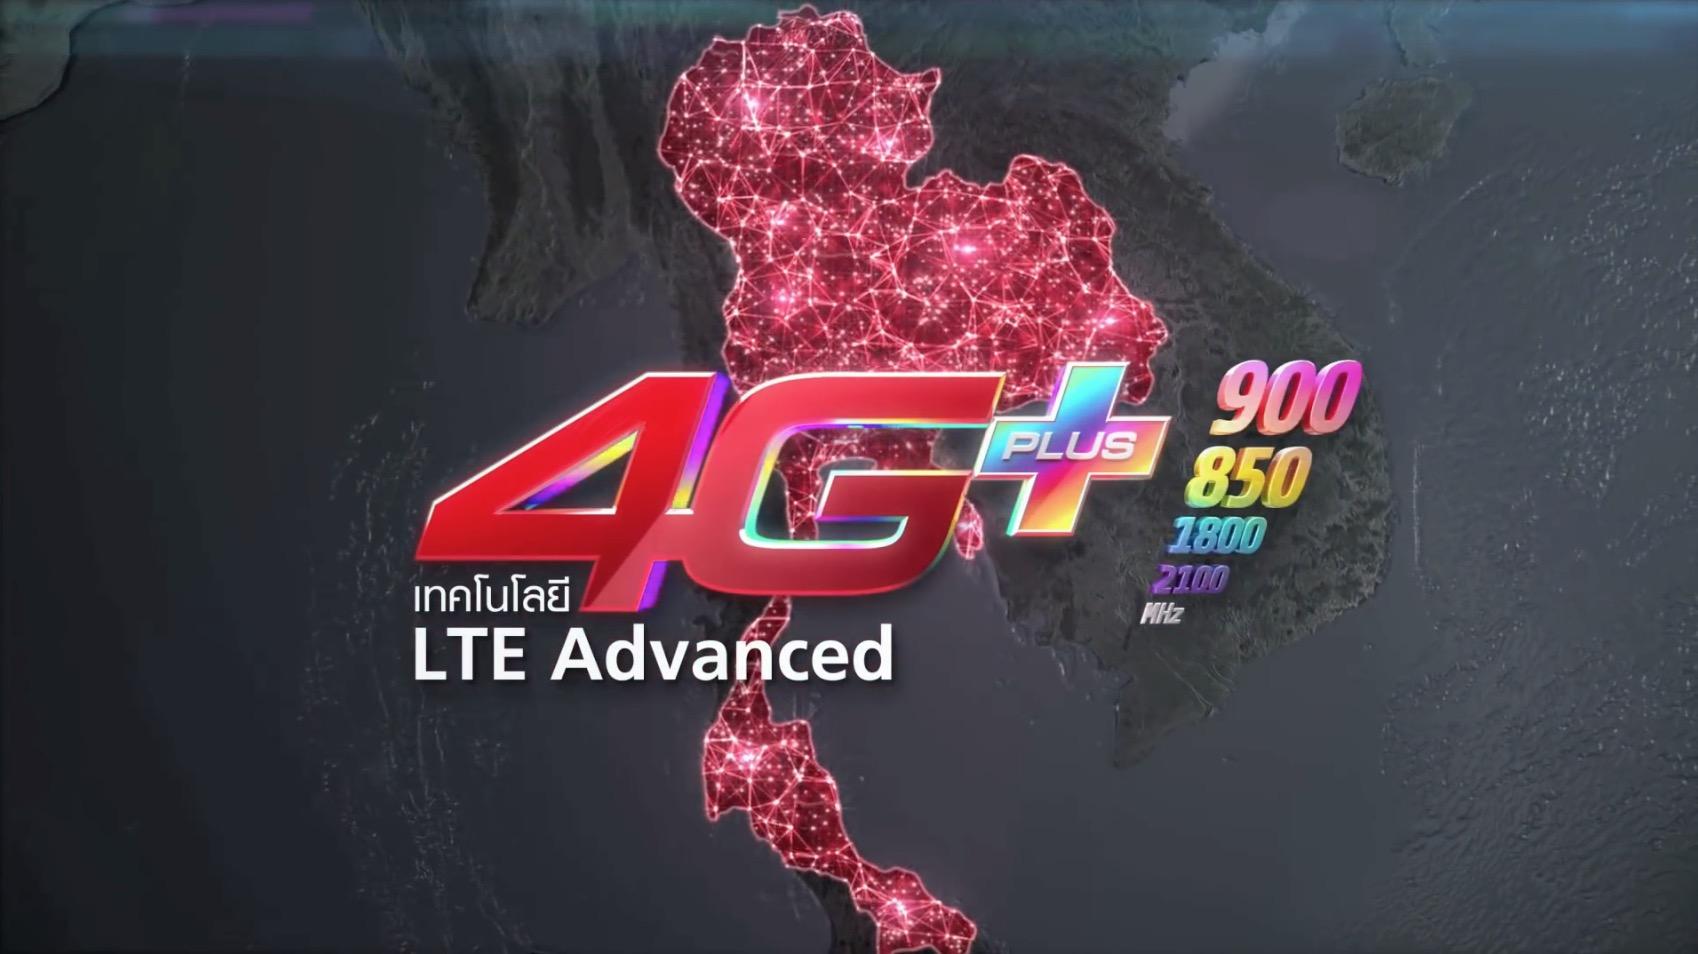 truemove h 4g+ lte advanced